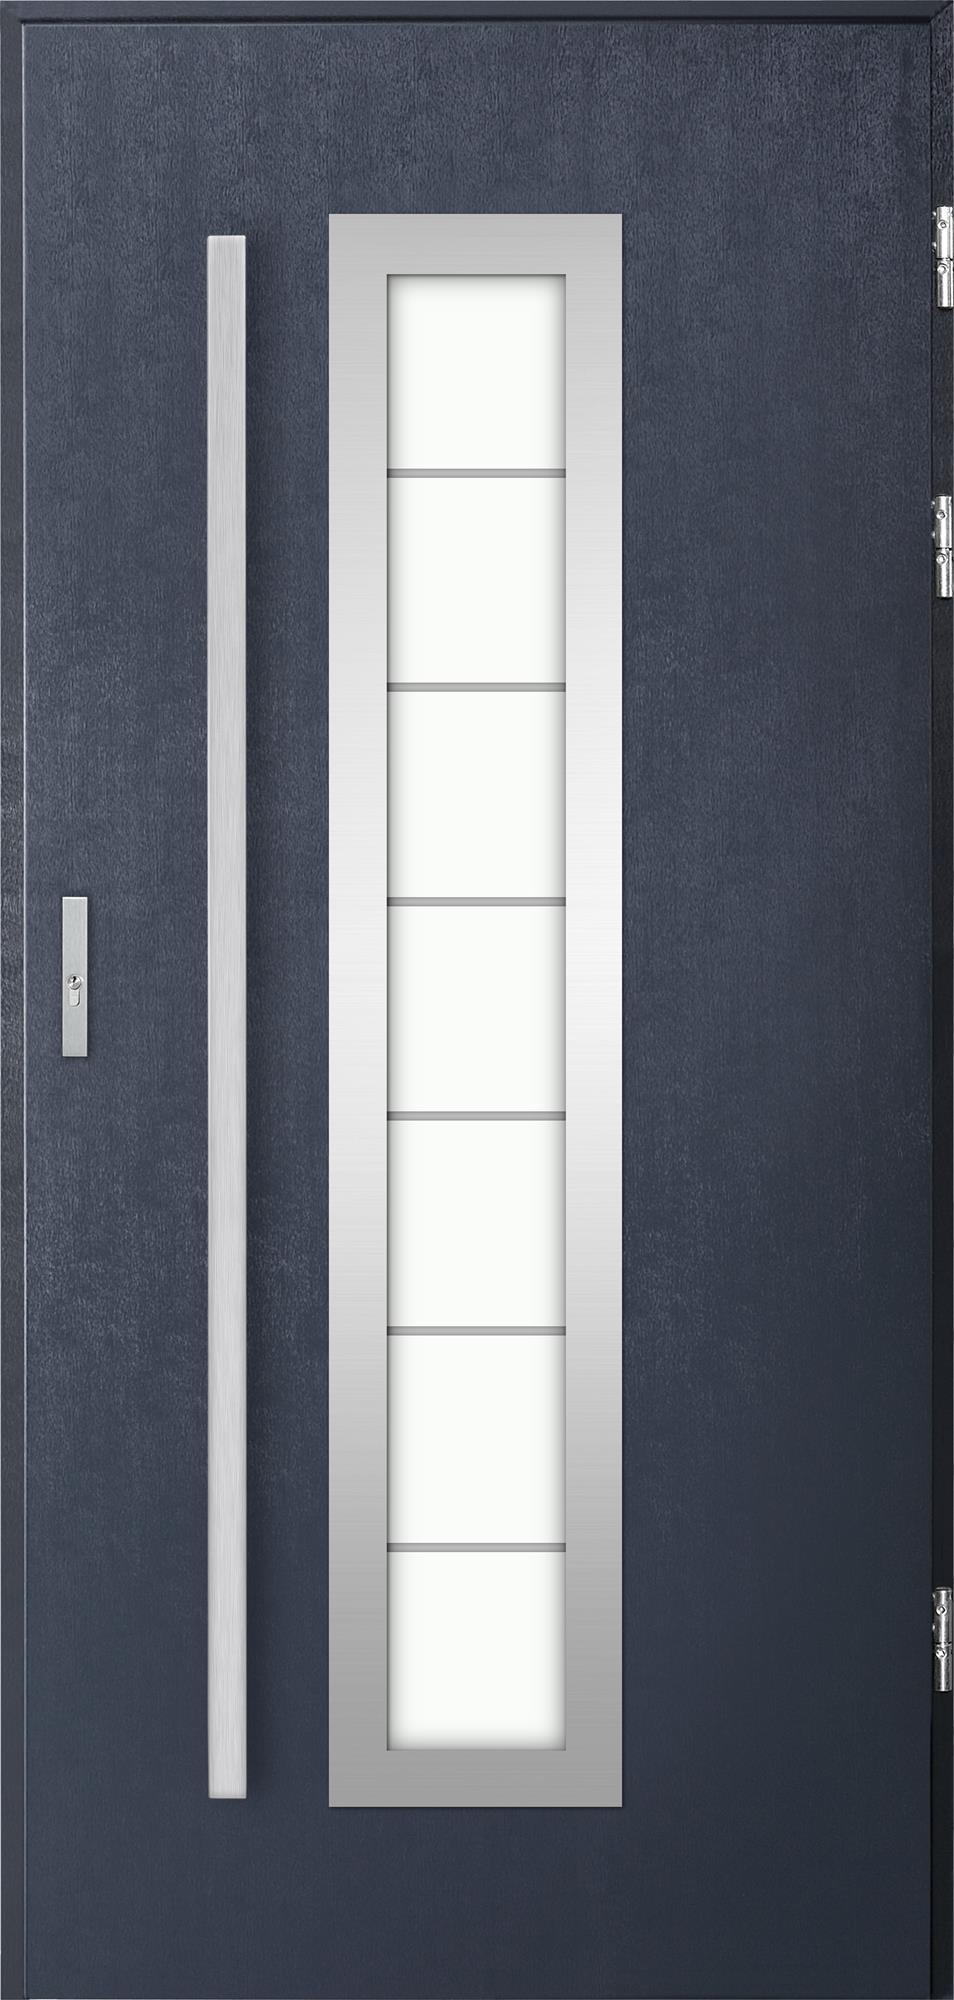 Venkovní vchodové dveøe Hevelio, tm. antracit